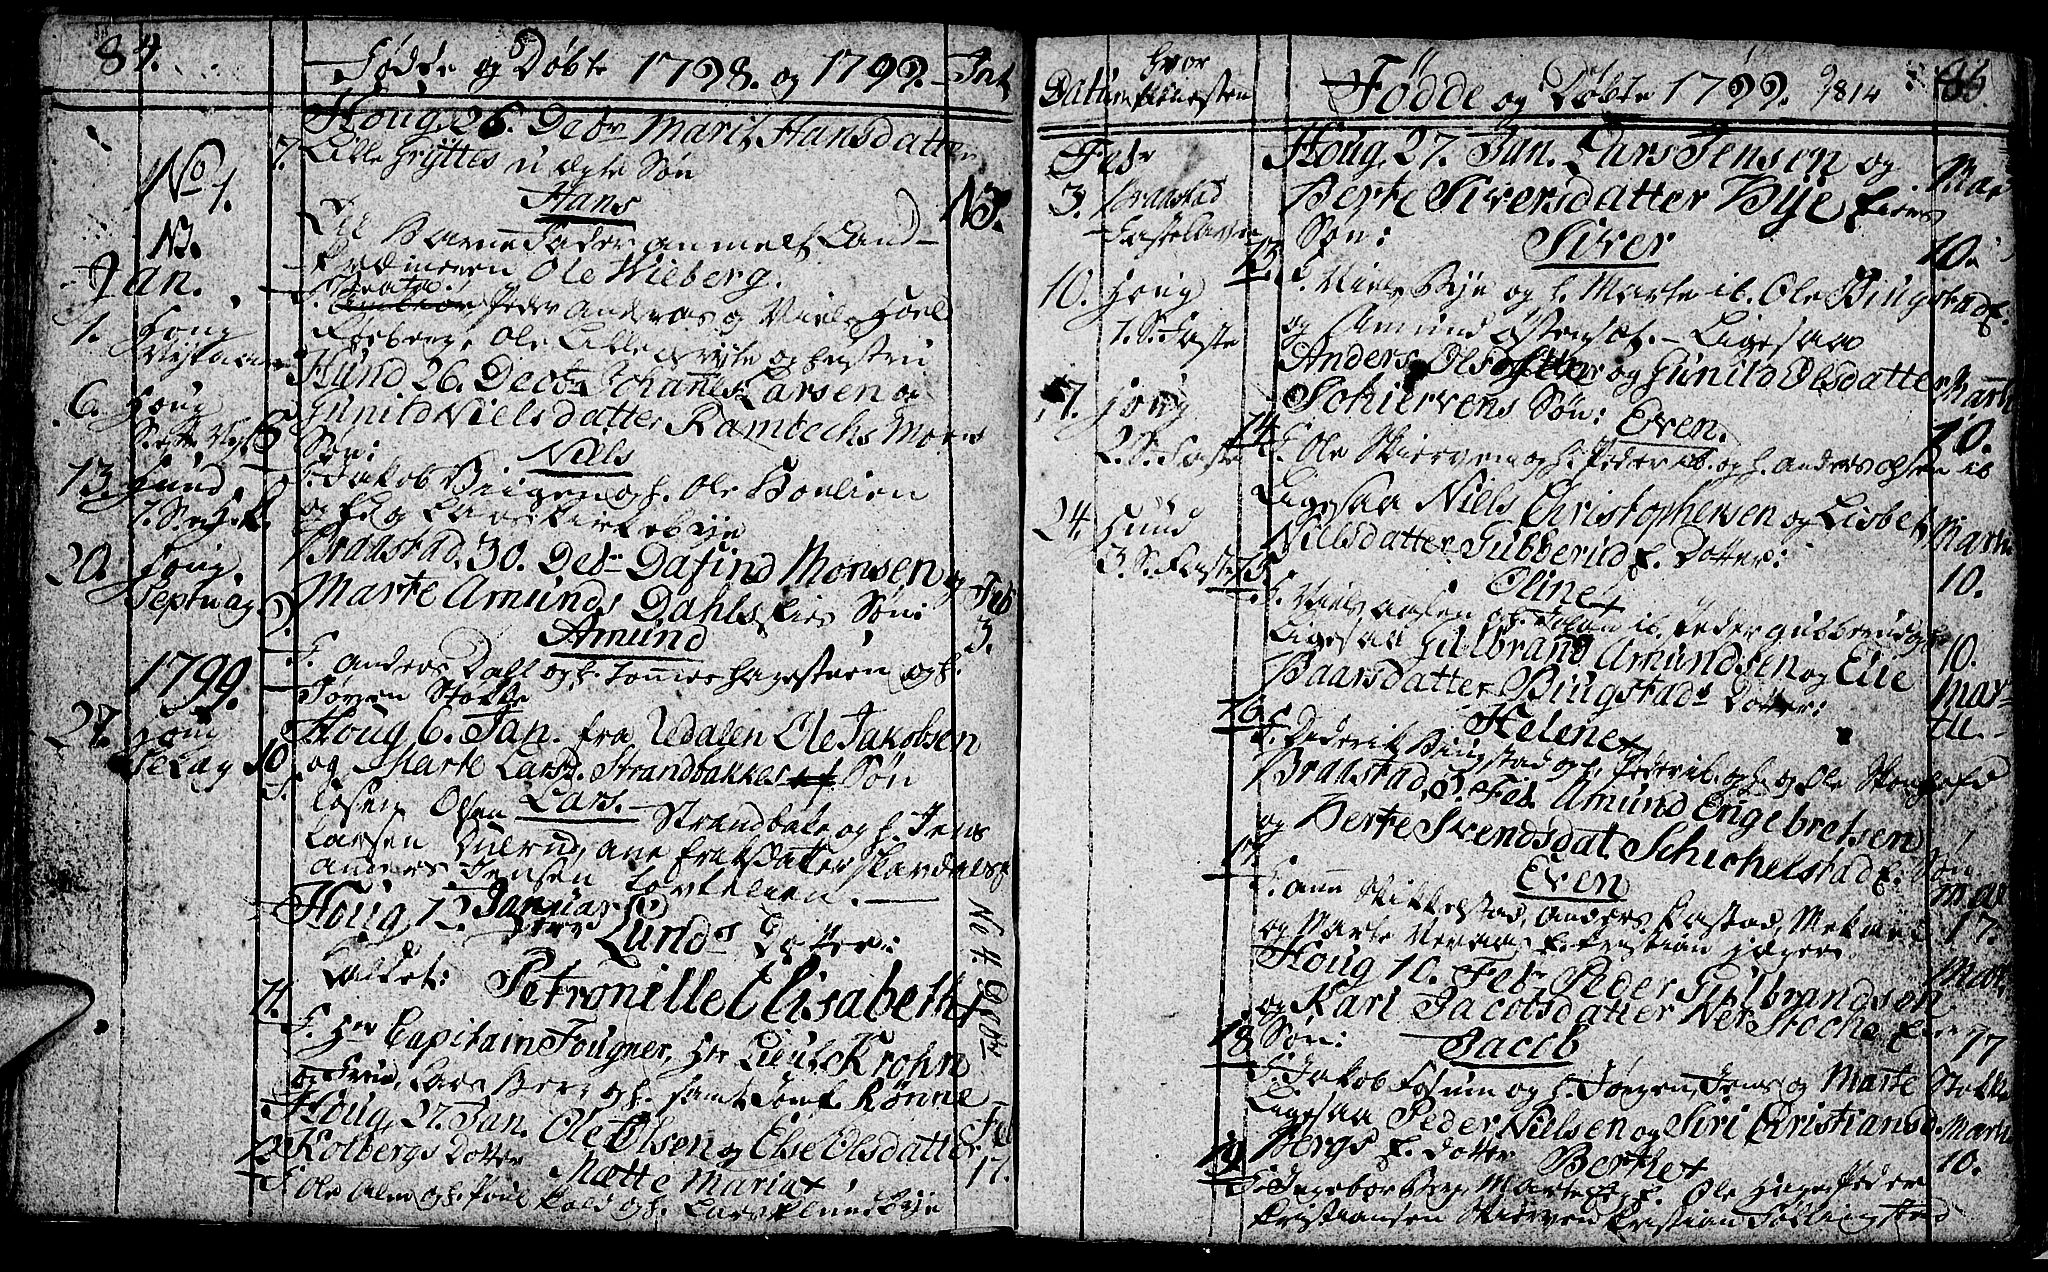 SAH, Vardal prestekontor, H/Ha/Hab/L0002: Klokkerbok nr. 2, 1790-1803, s. 84-85